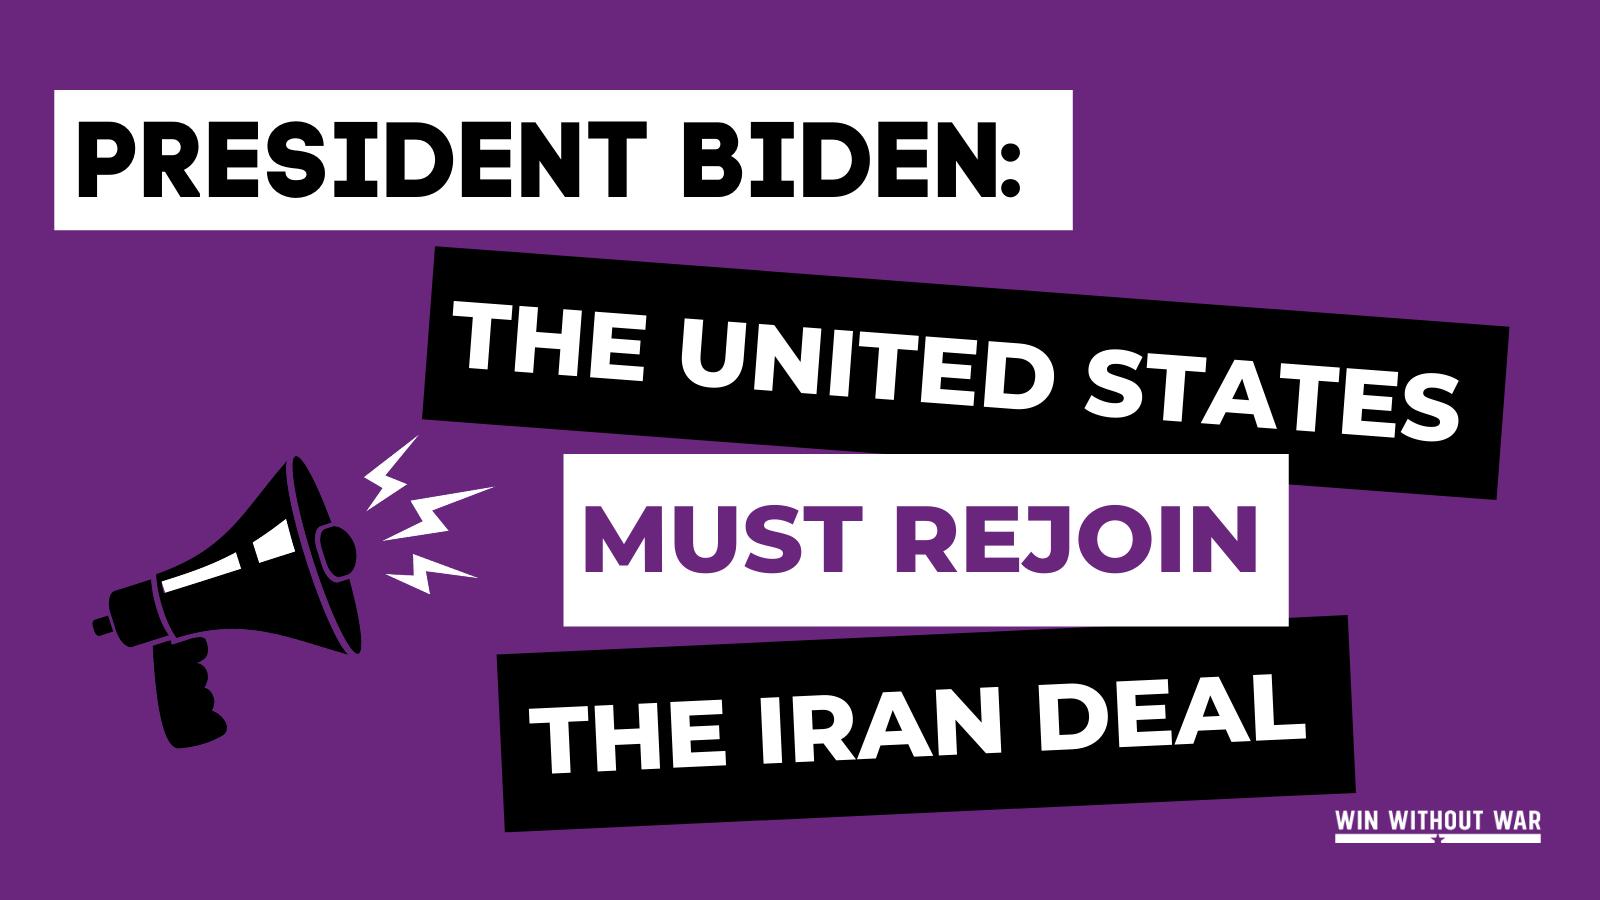 President Biden: Restore the Iran Deal